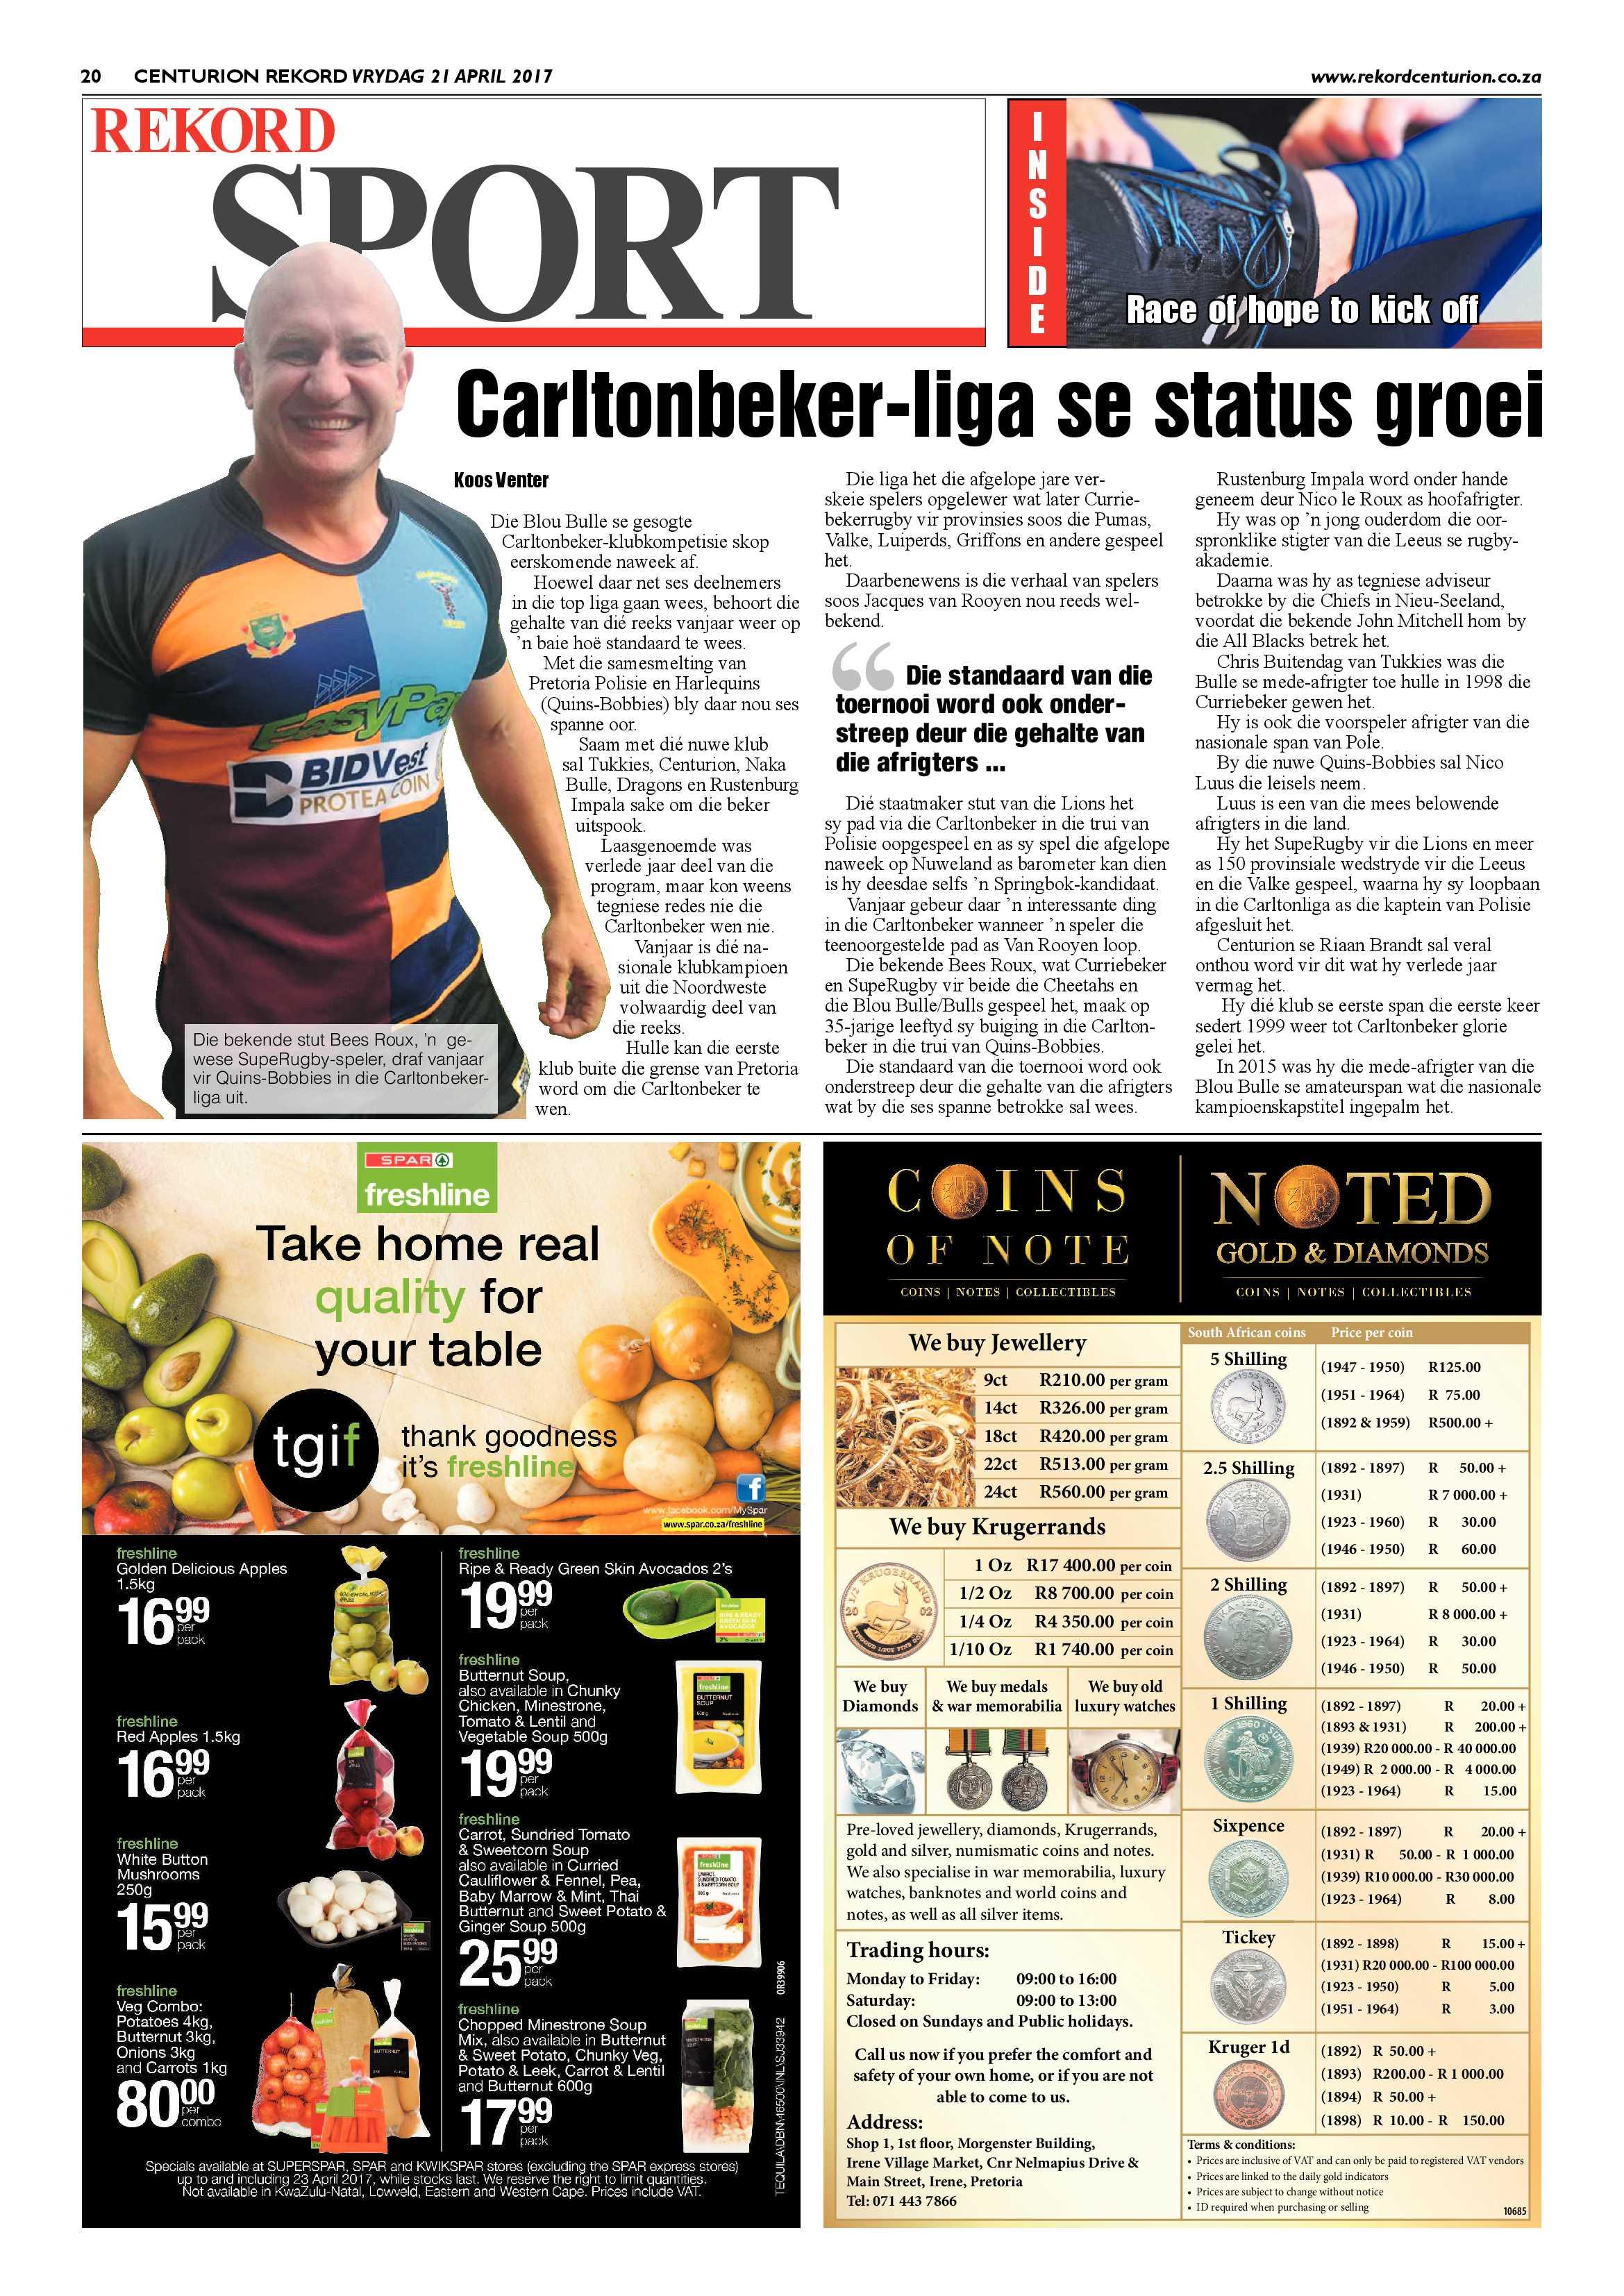 rekord-centurion-21-april-2017-epapers-page-20